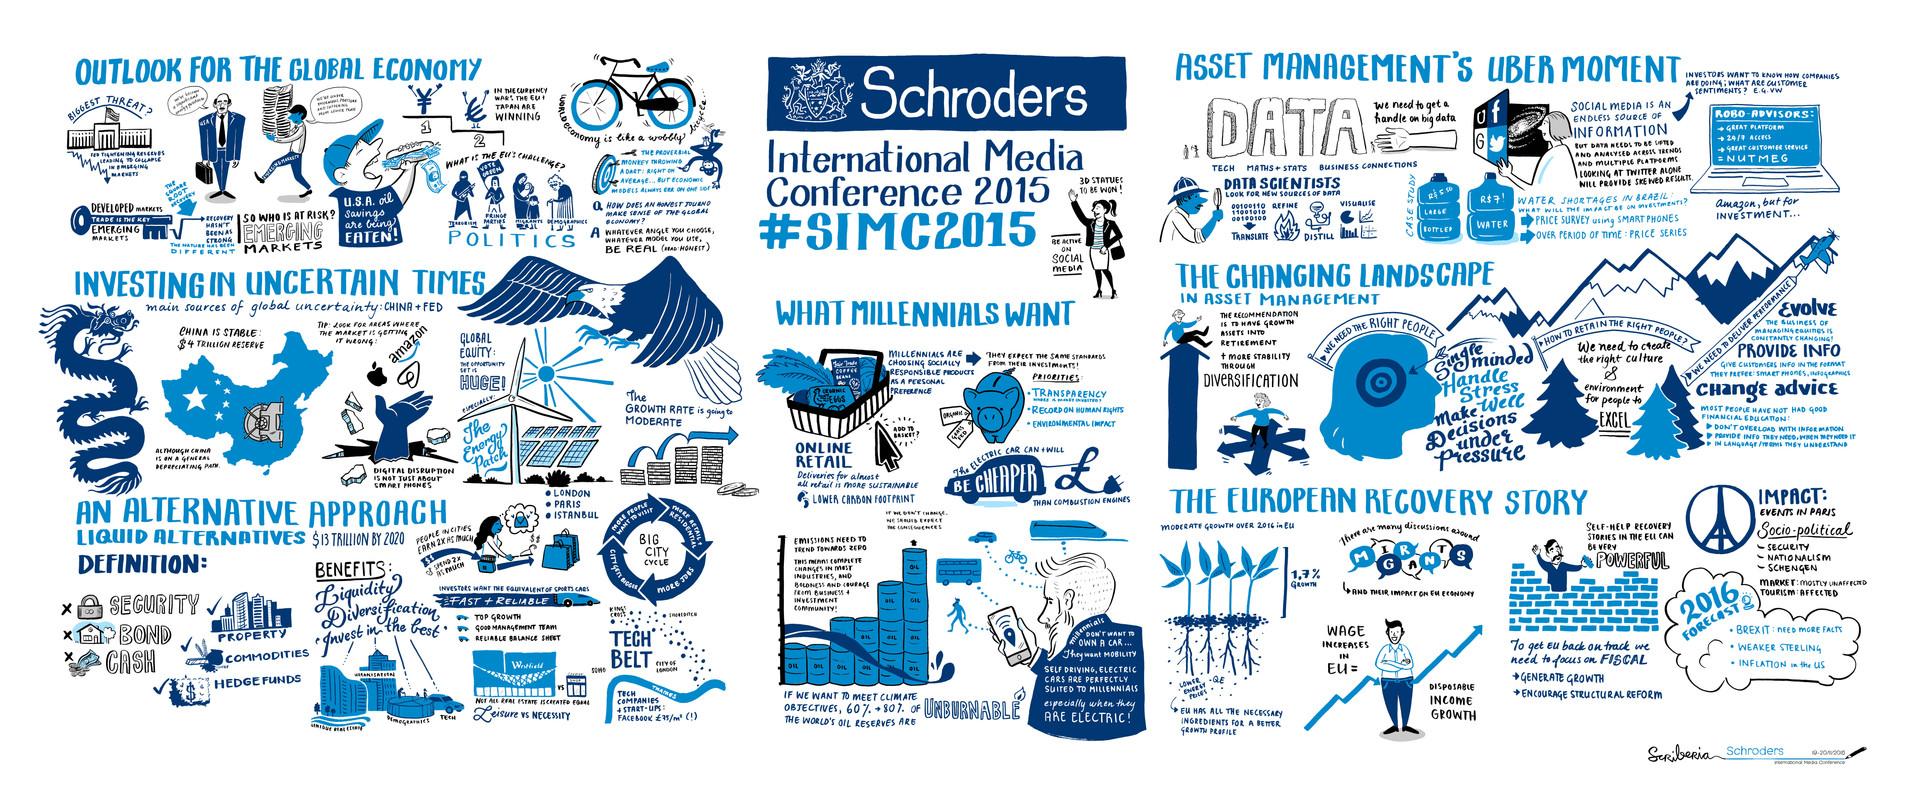 Schroders International Media Conference 2015